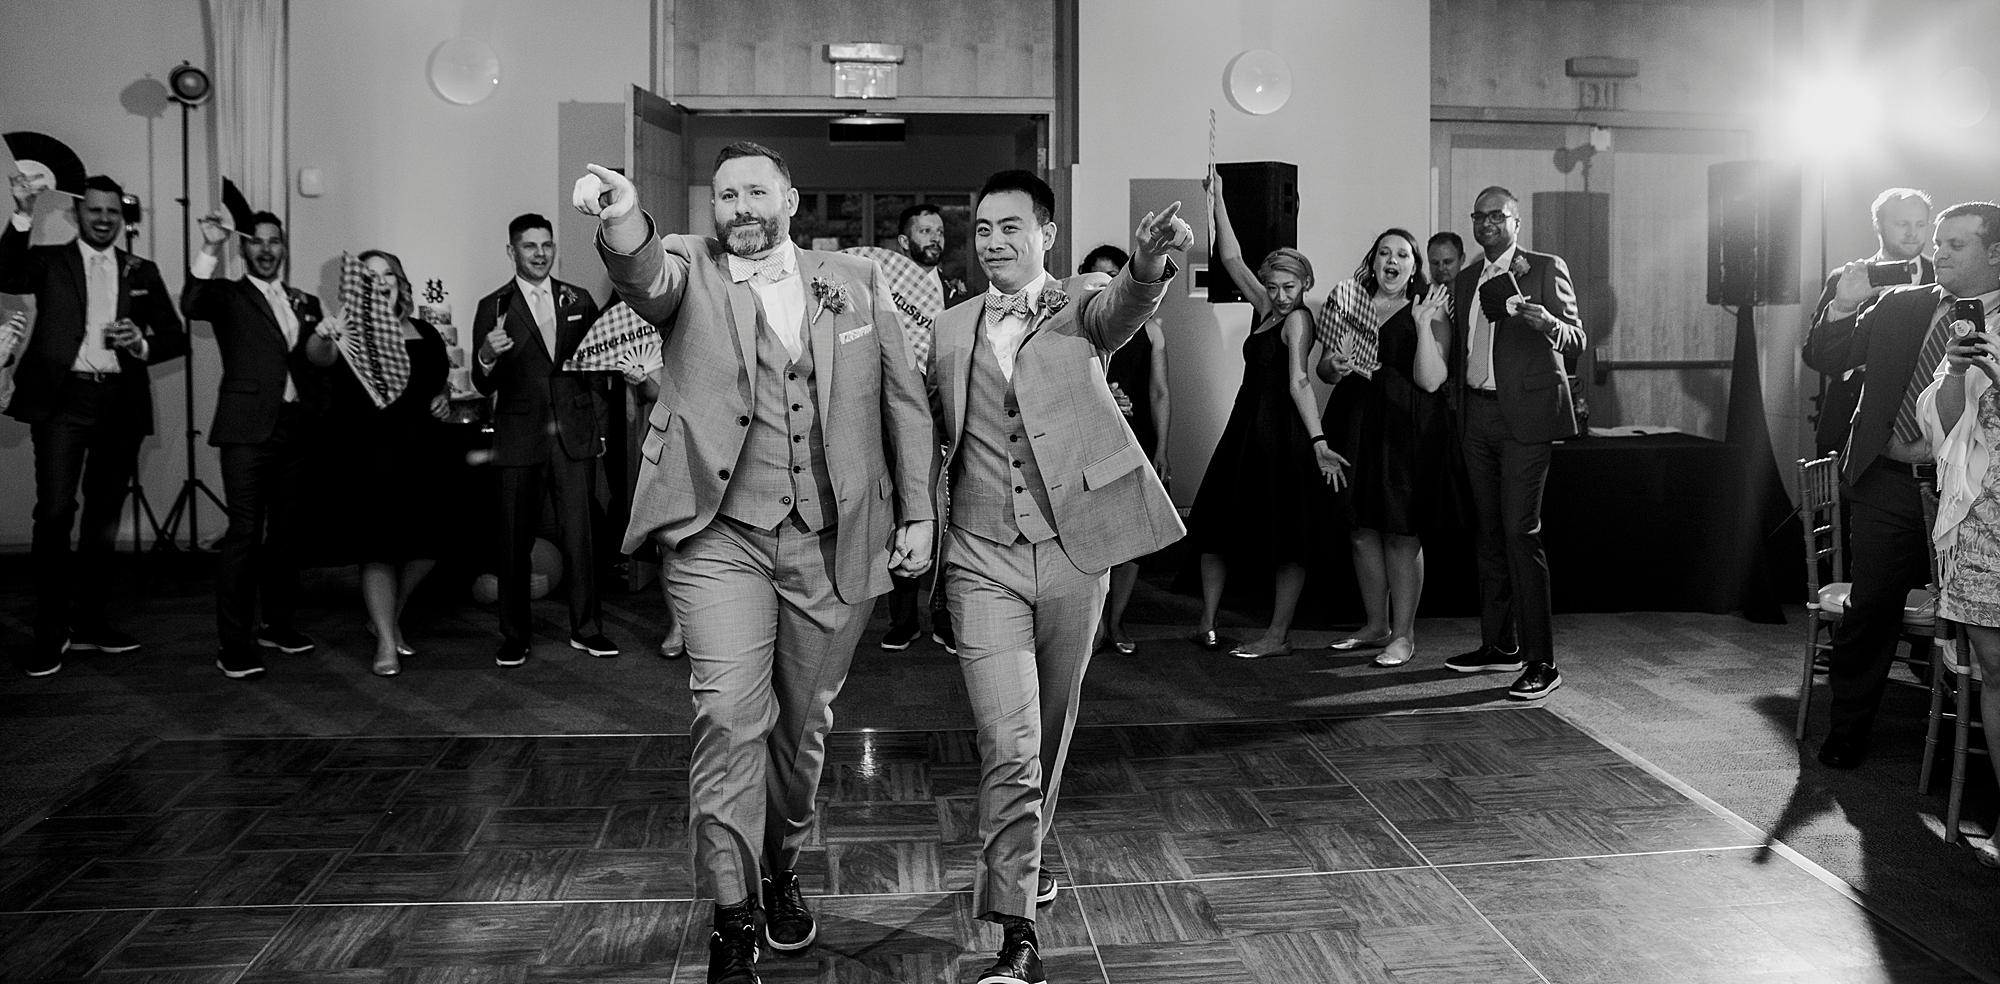 Dan_and_Byron_Love_by_Joe_Mac_Philadelphia_Wedding_LGBTQ_Photography_Gay_Independence_visitor_Center_124.JPG